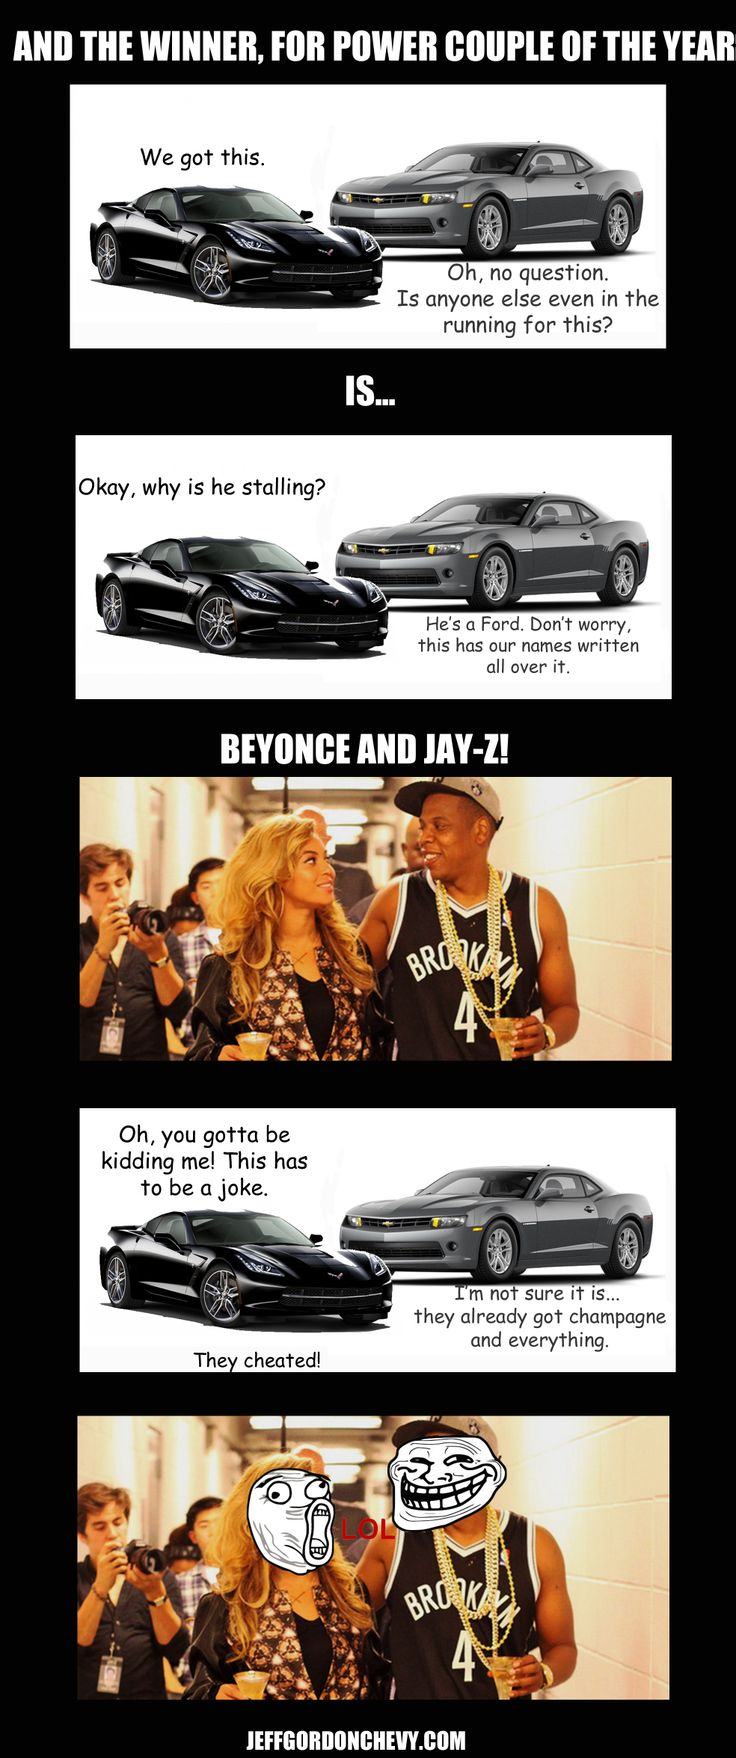 Power Couple of the Year #Beyonce #JayZ #Corvette #Camaro #meme #carmemes